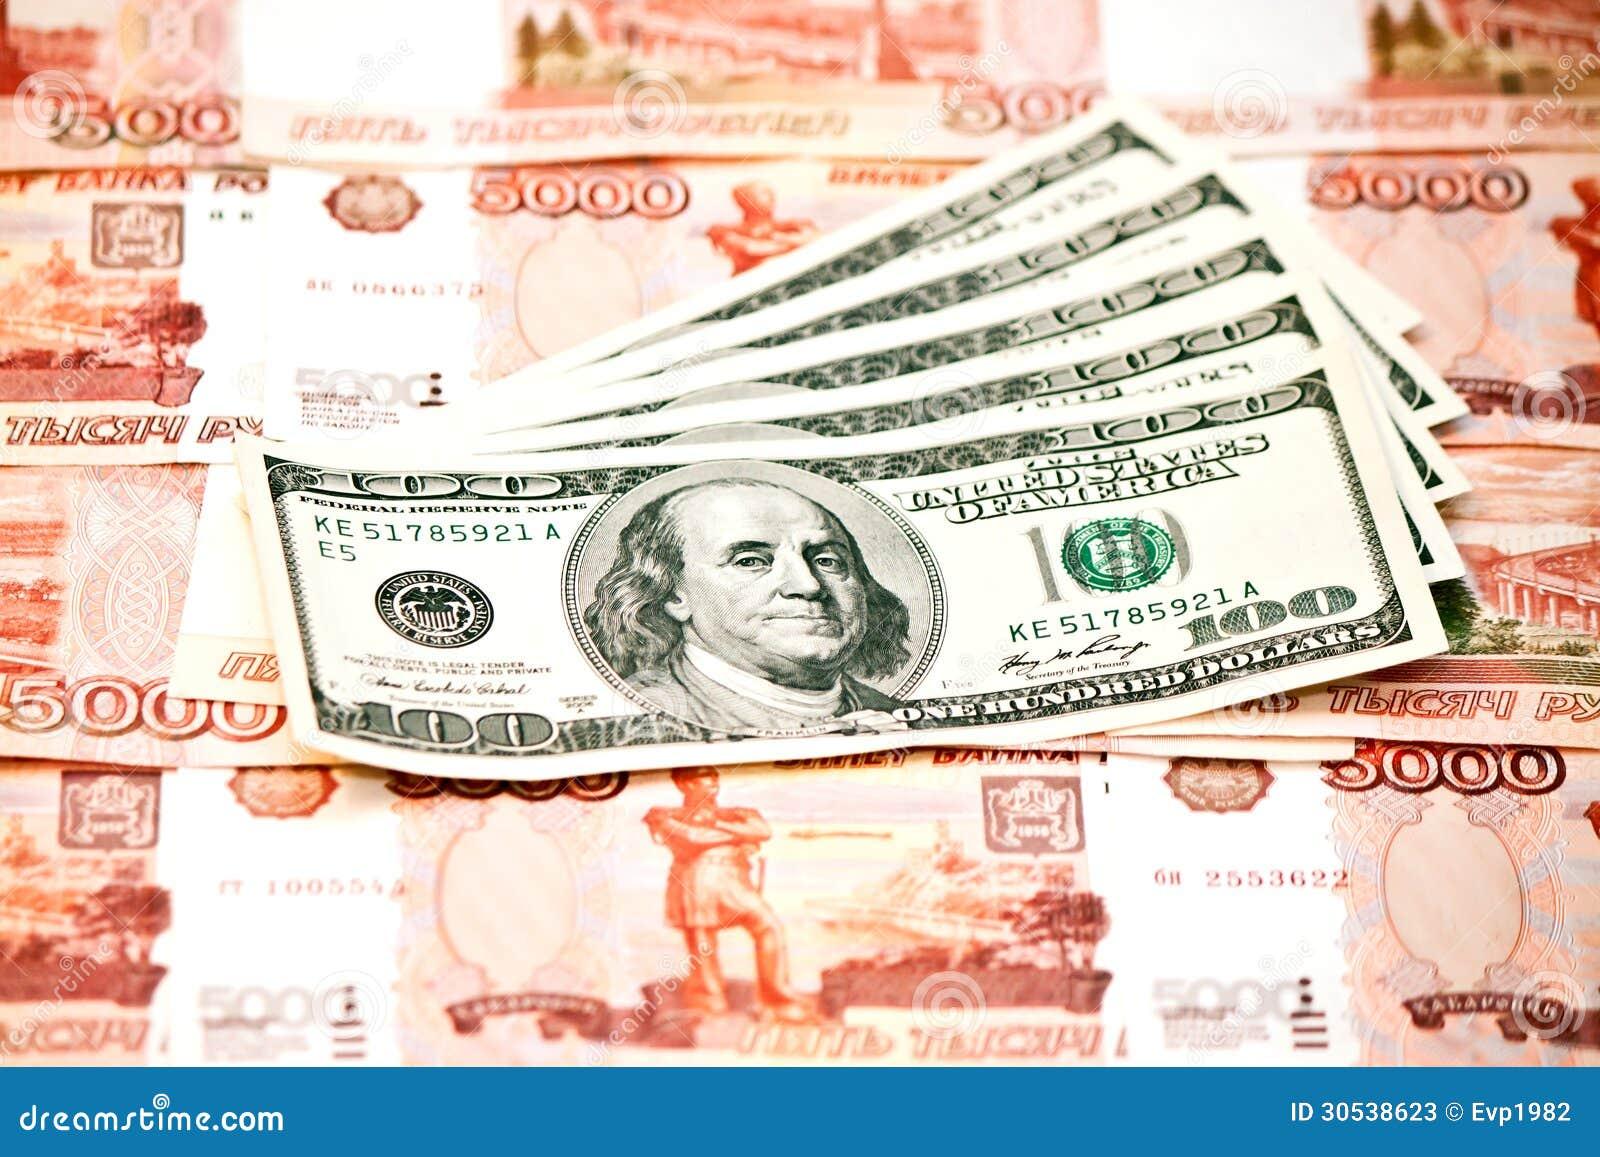 Dollar ruble leinster ladies gaa championship betting